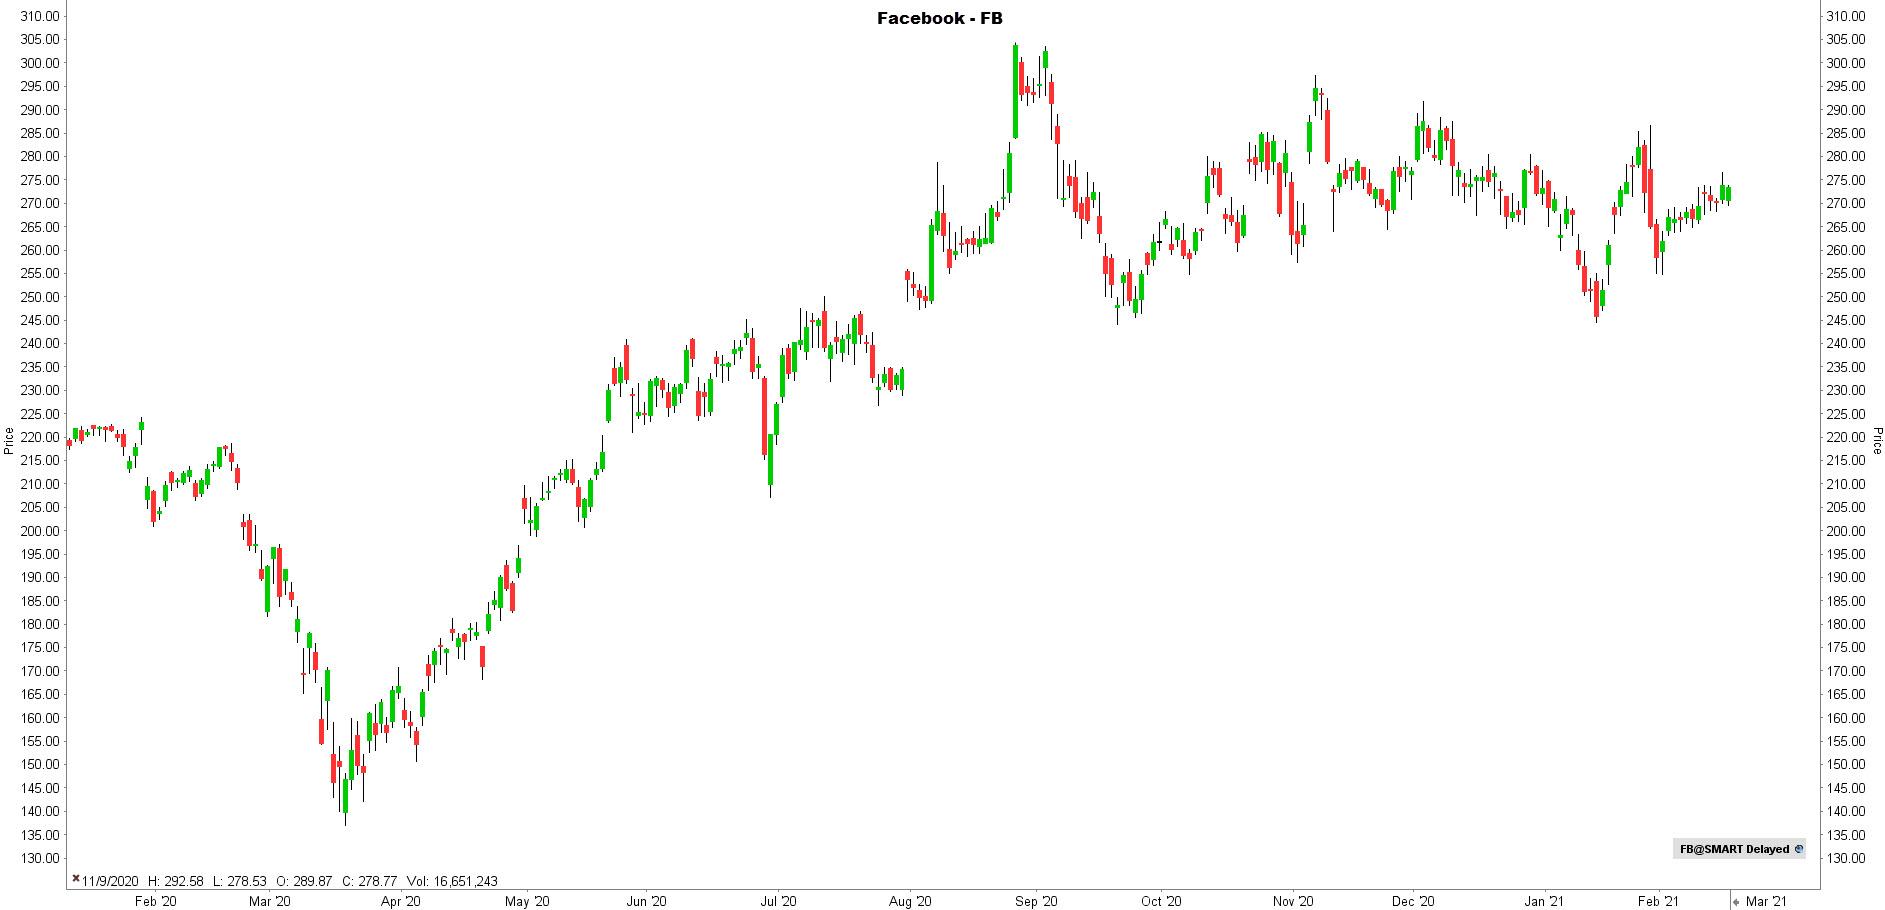 la chronique lynx broker 180221 - graphique Facebook